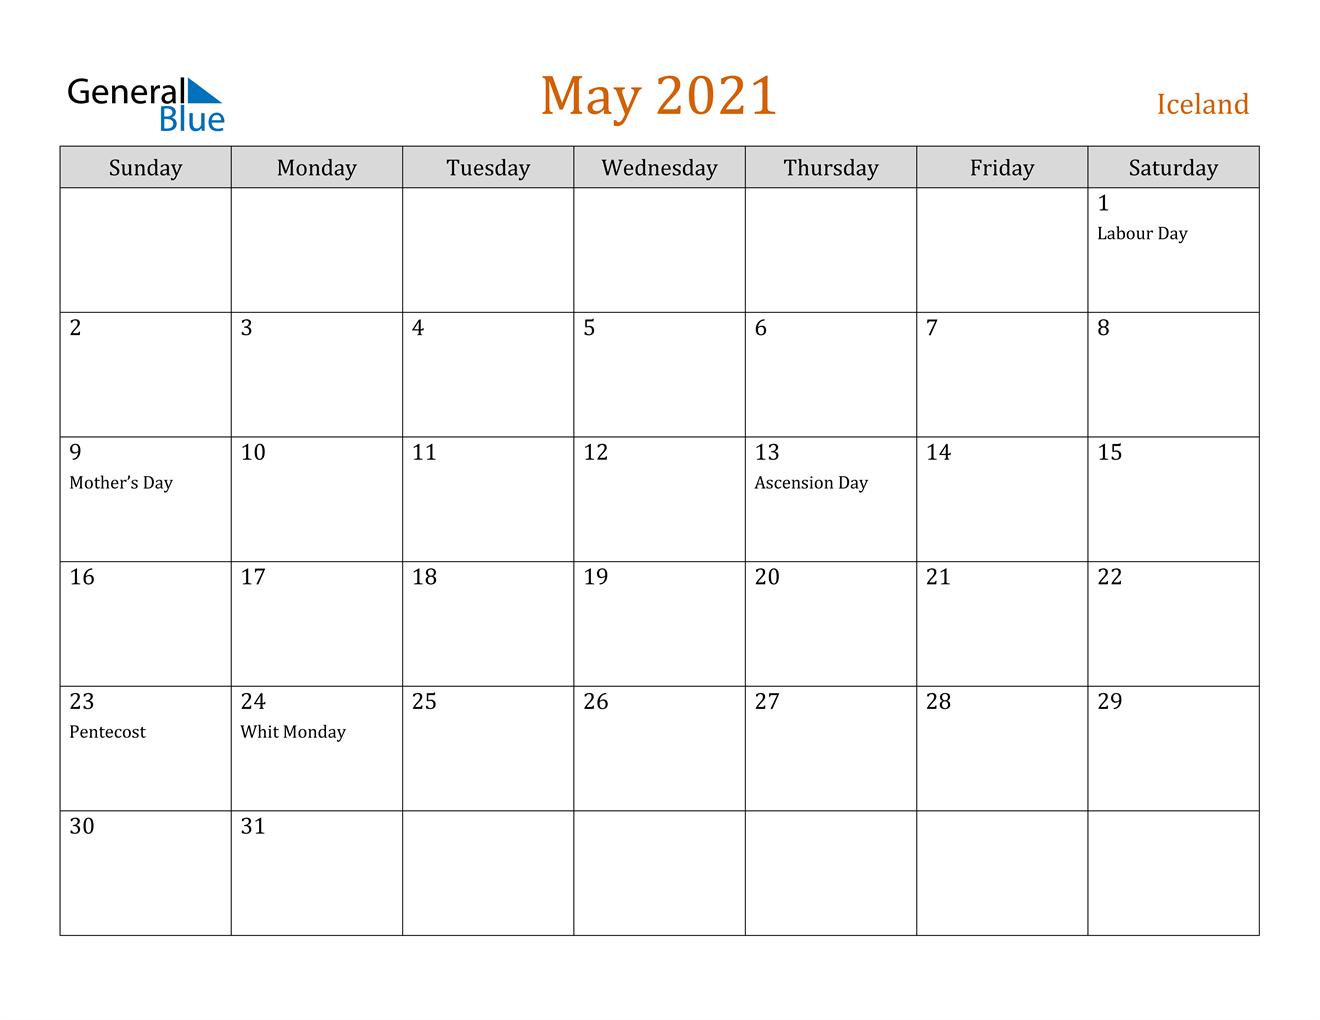 May 2021 Calendar - Iceland